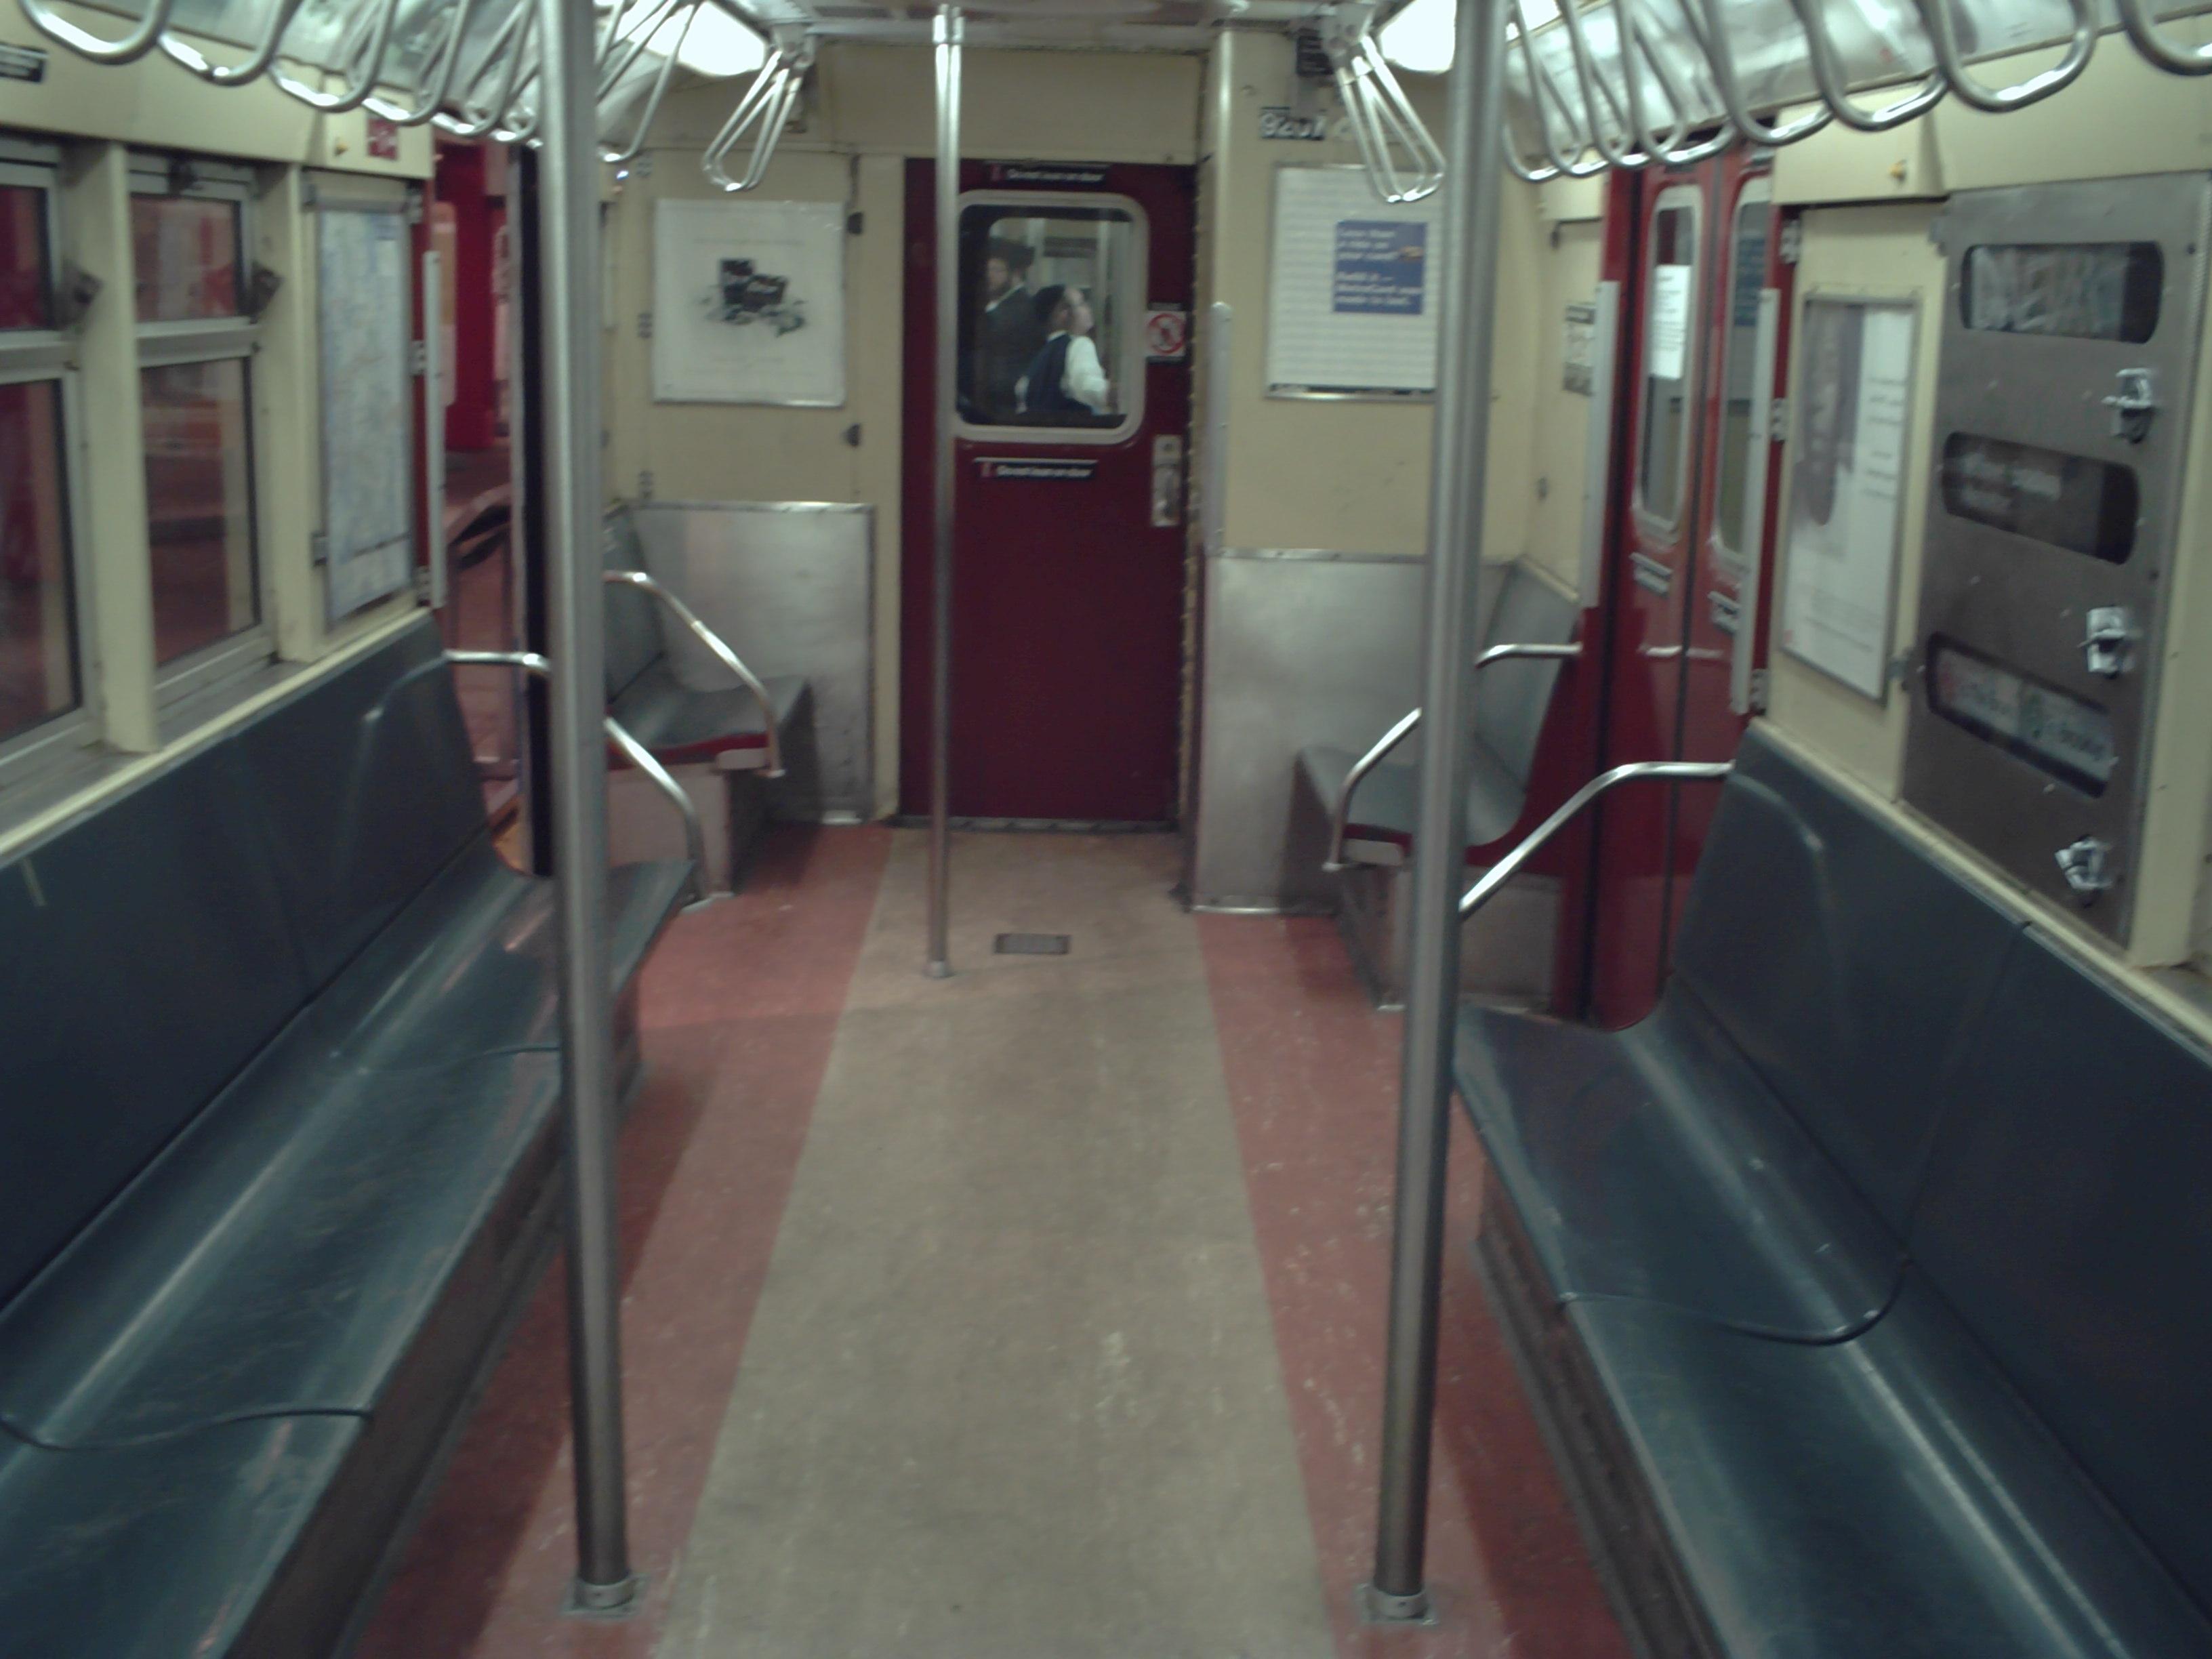 r33 new york city subway car. Black Bedroom Furniture Sets. Home Design Ideas